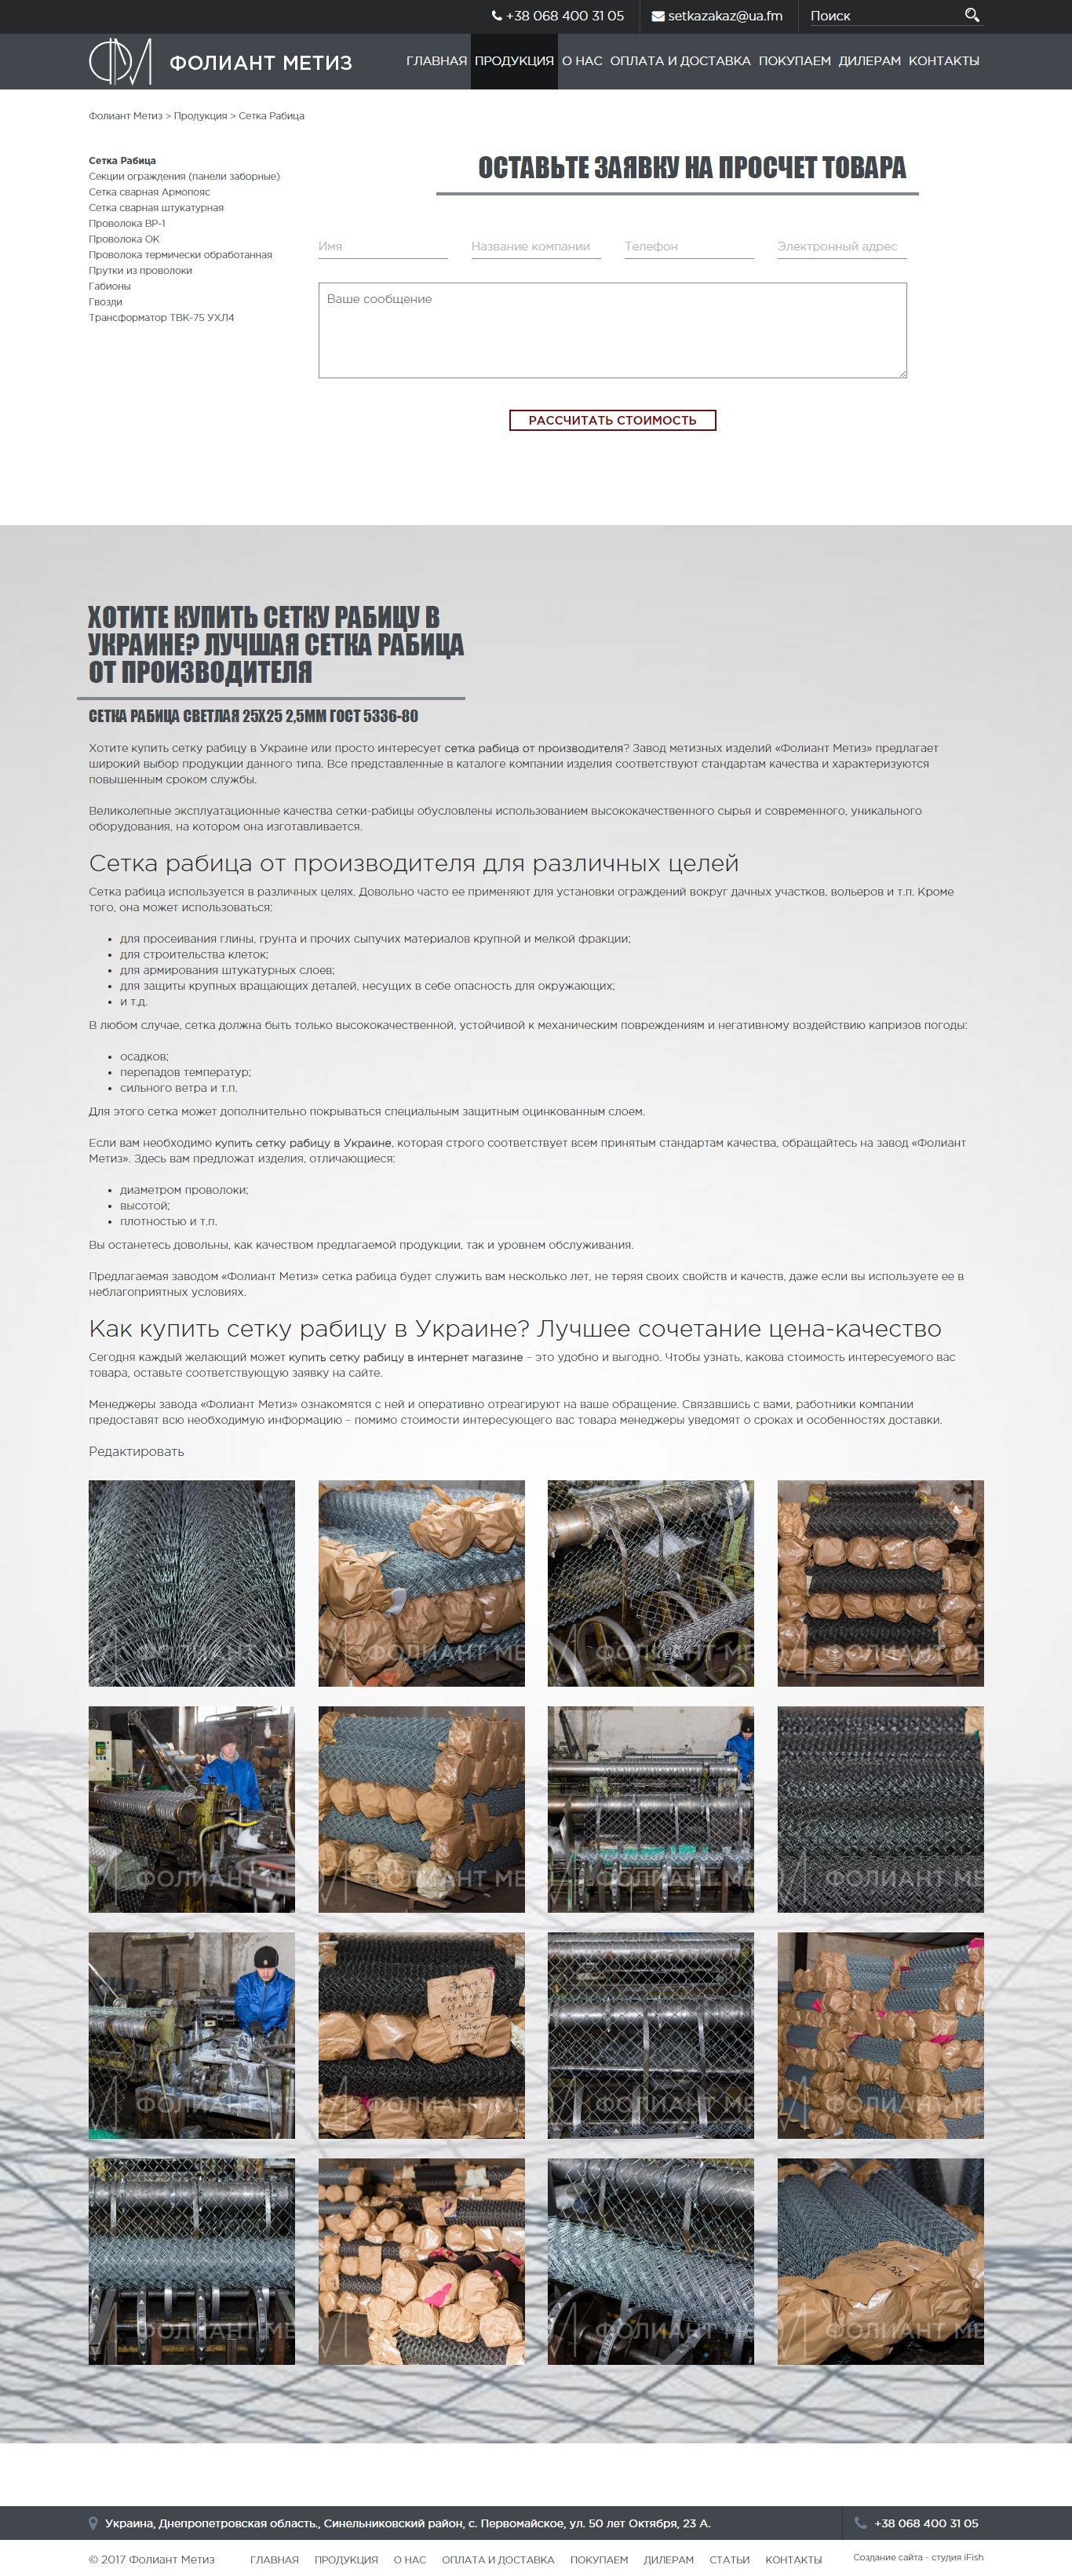 production-foliant-metiz.com.ua_setka-rabitsa_